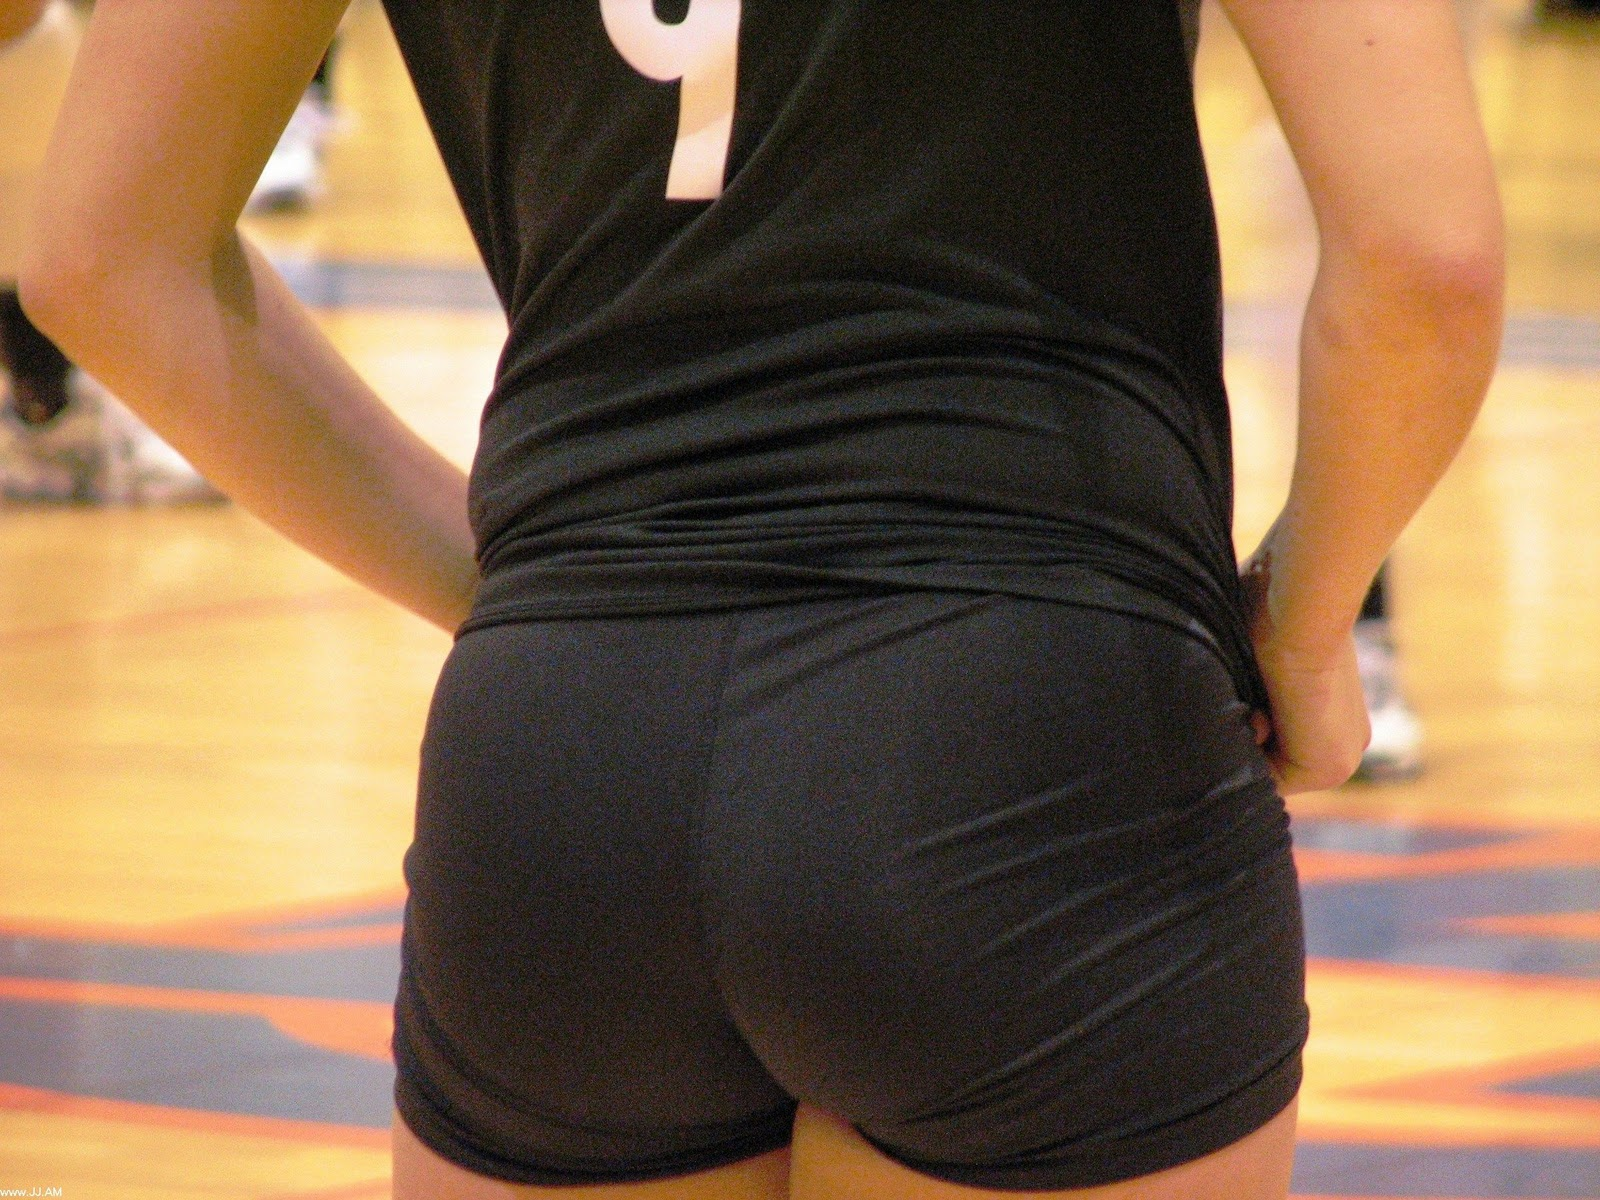 Sexy girls in spandex shorts